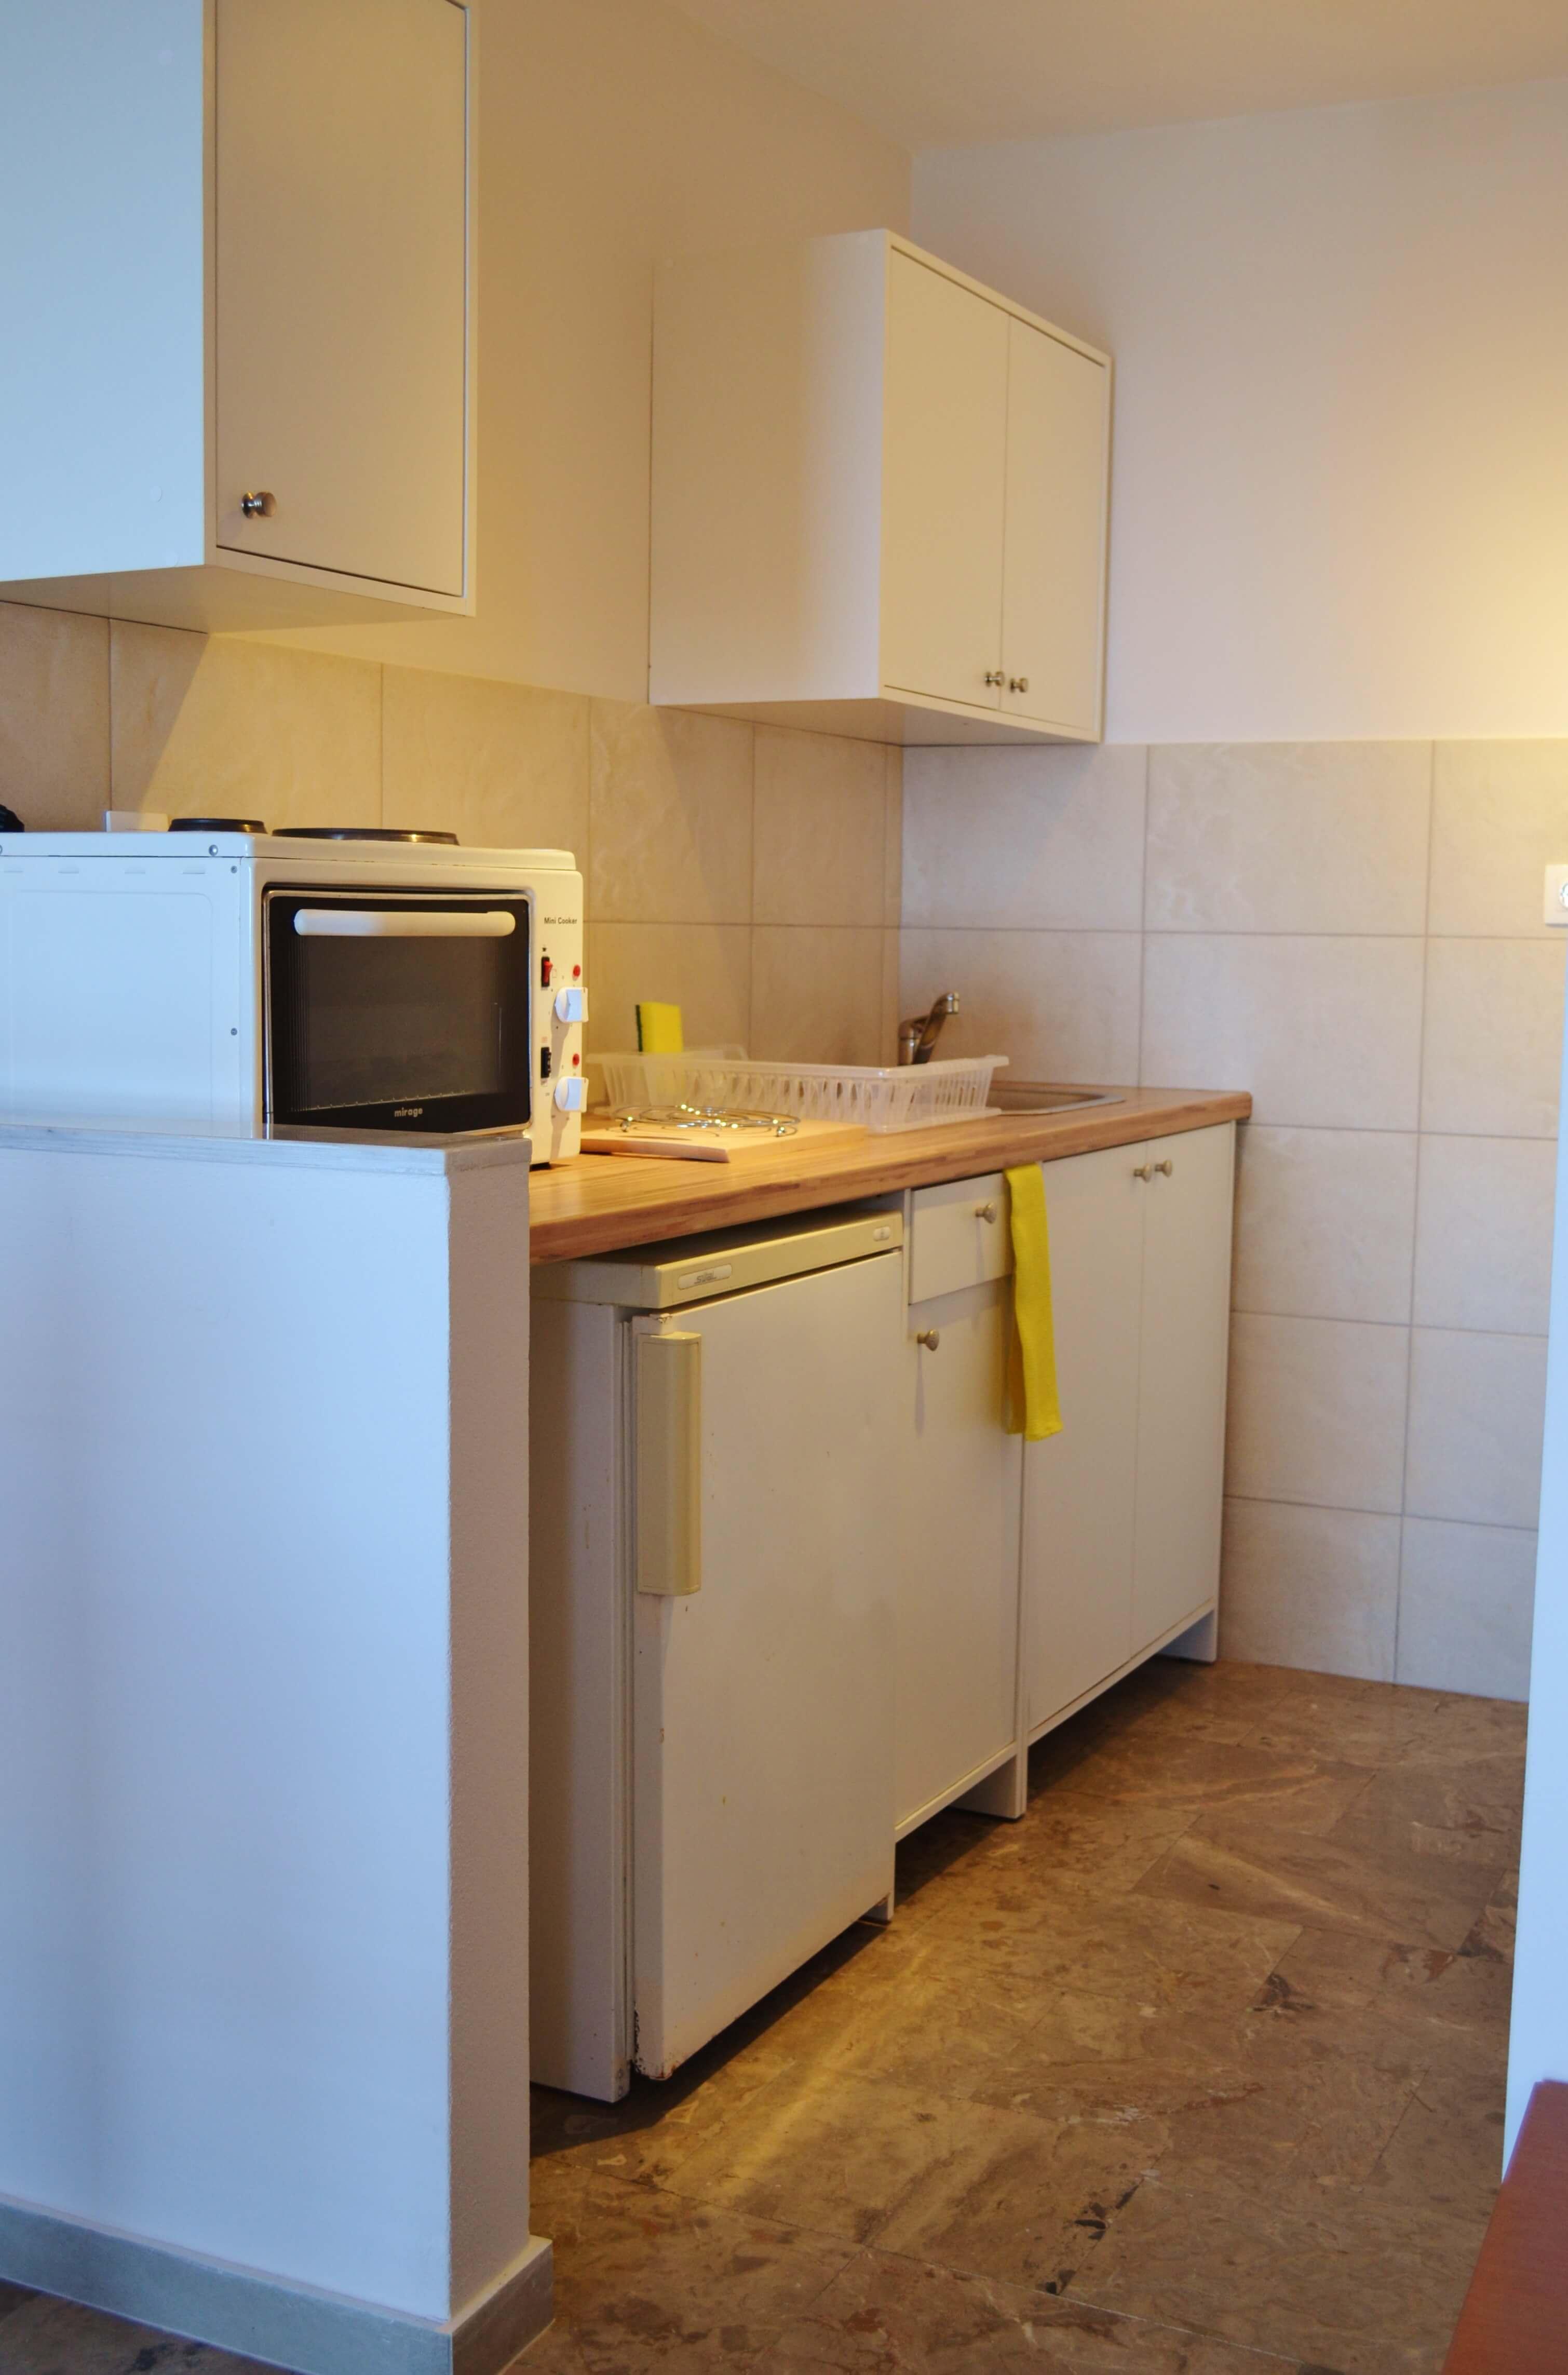 bella vista apartments corfu studio mit kitchenette. Black Bedroom Furniture Sets. Home Design Ideas